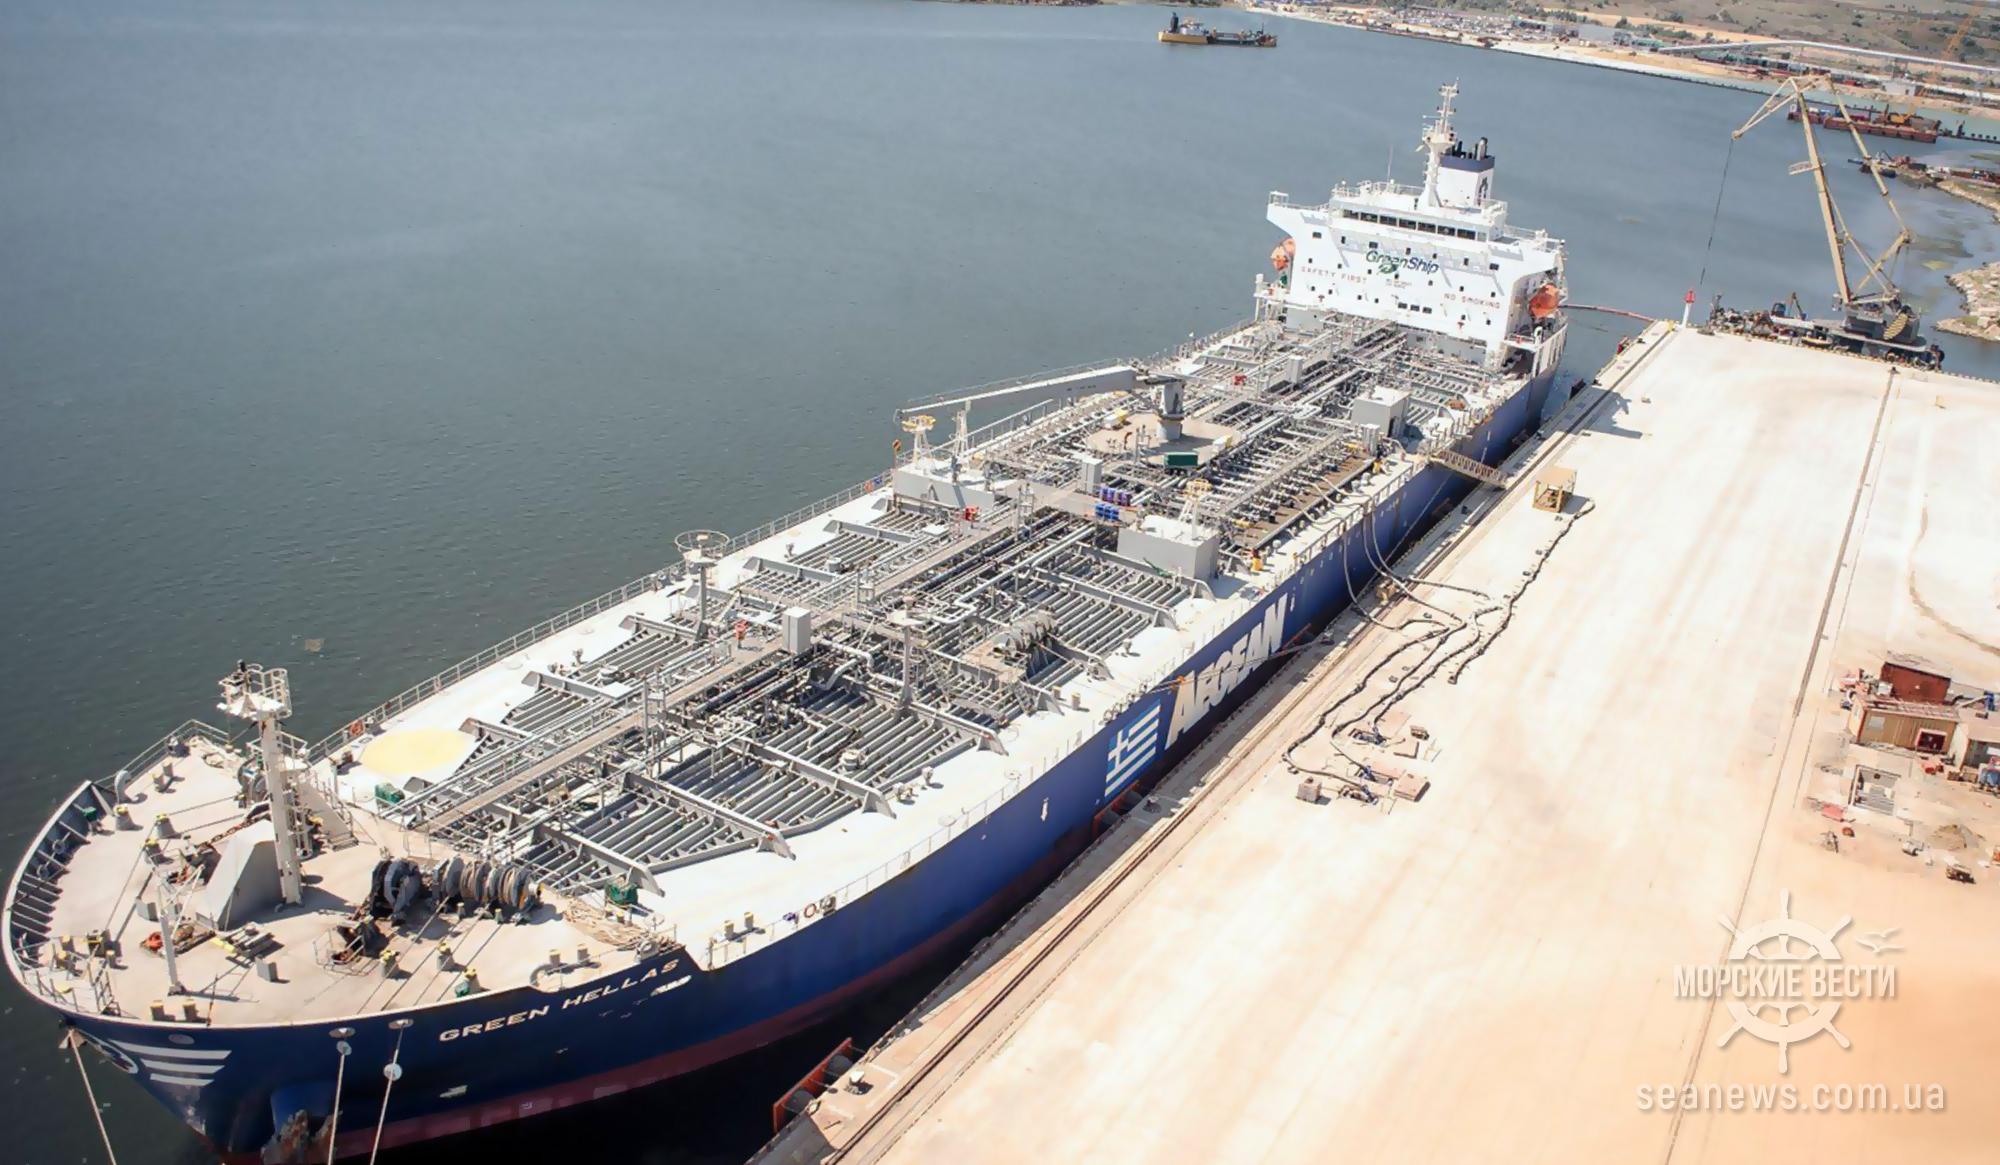 Украина установила рекорд по экспорту подсолнечного масла танкерами